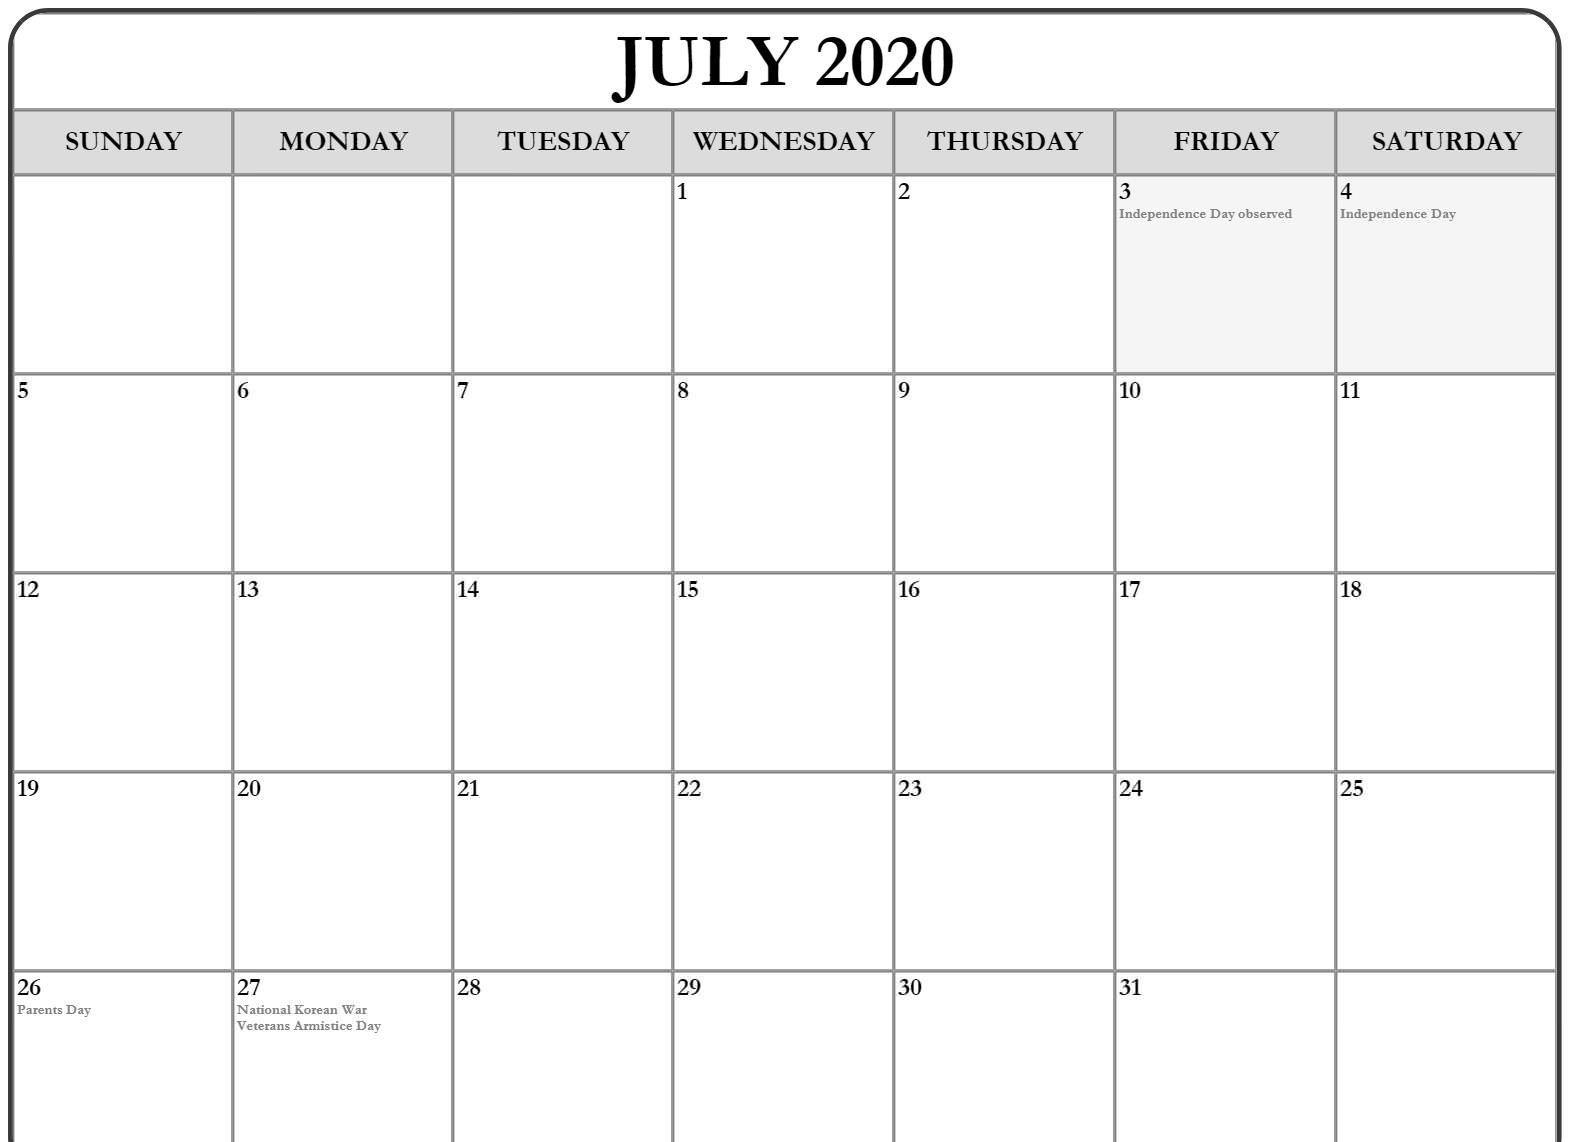 July 2020 Calendar Holidays Australia